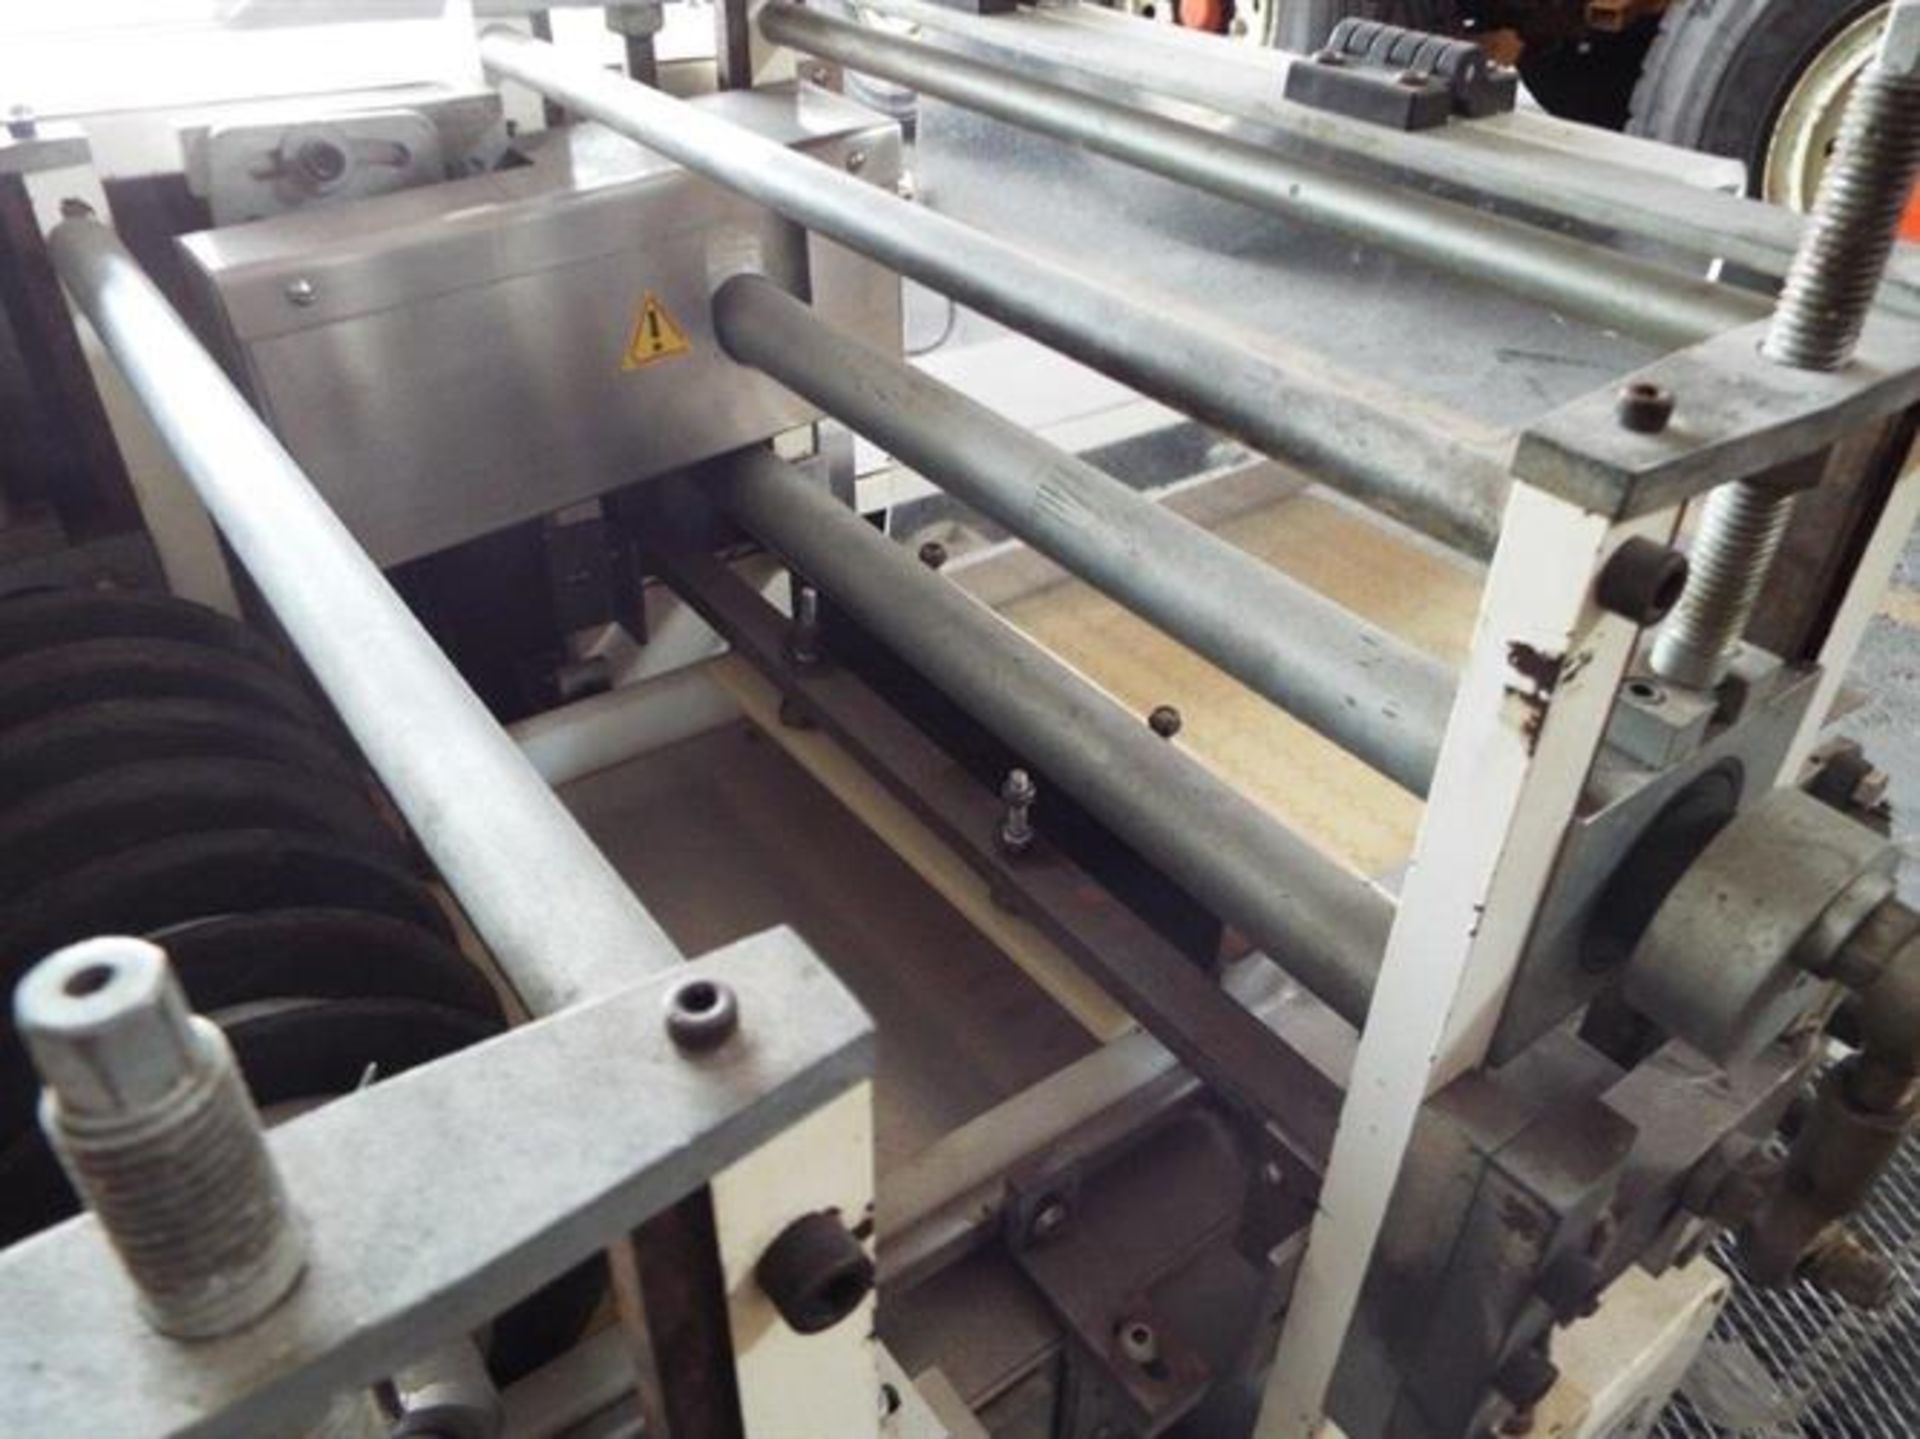 Tecmaq 290 mm Wide Slab Forming Line - Model TM-6H built 2012 - Three sets of gauging/sheeting - Image 19 of 30